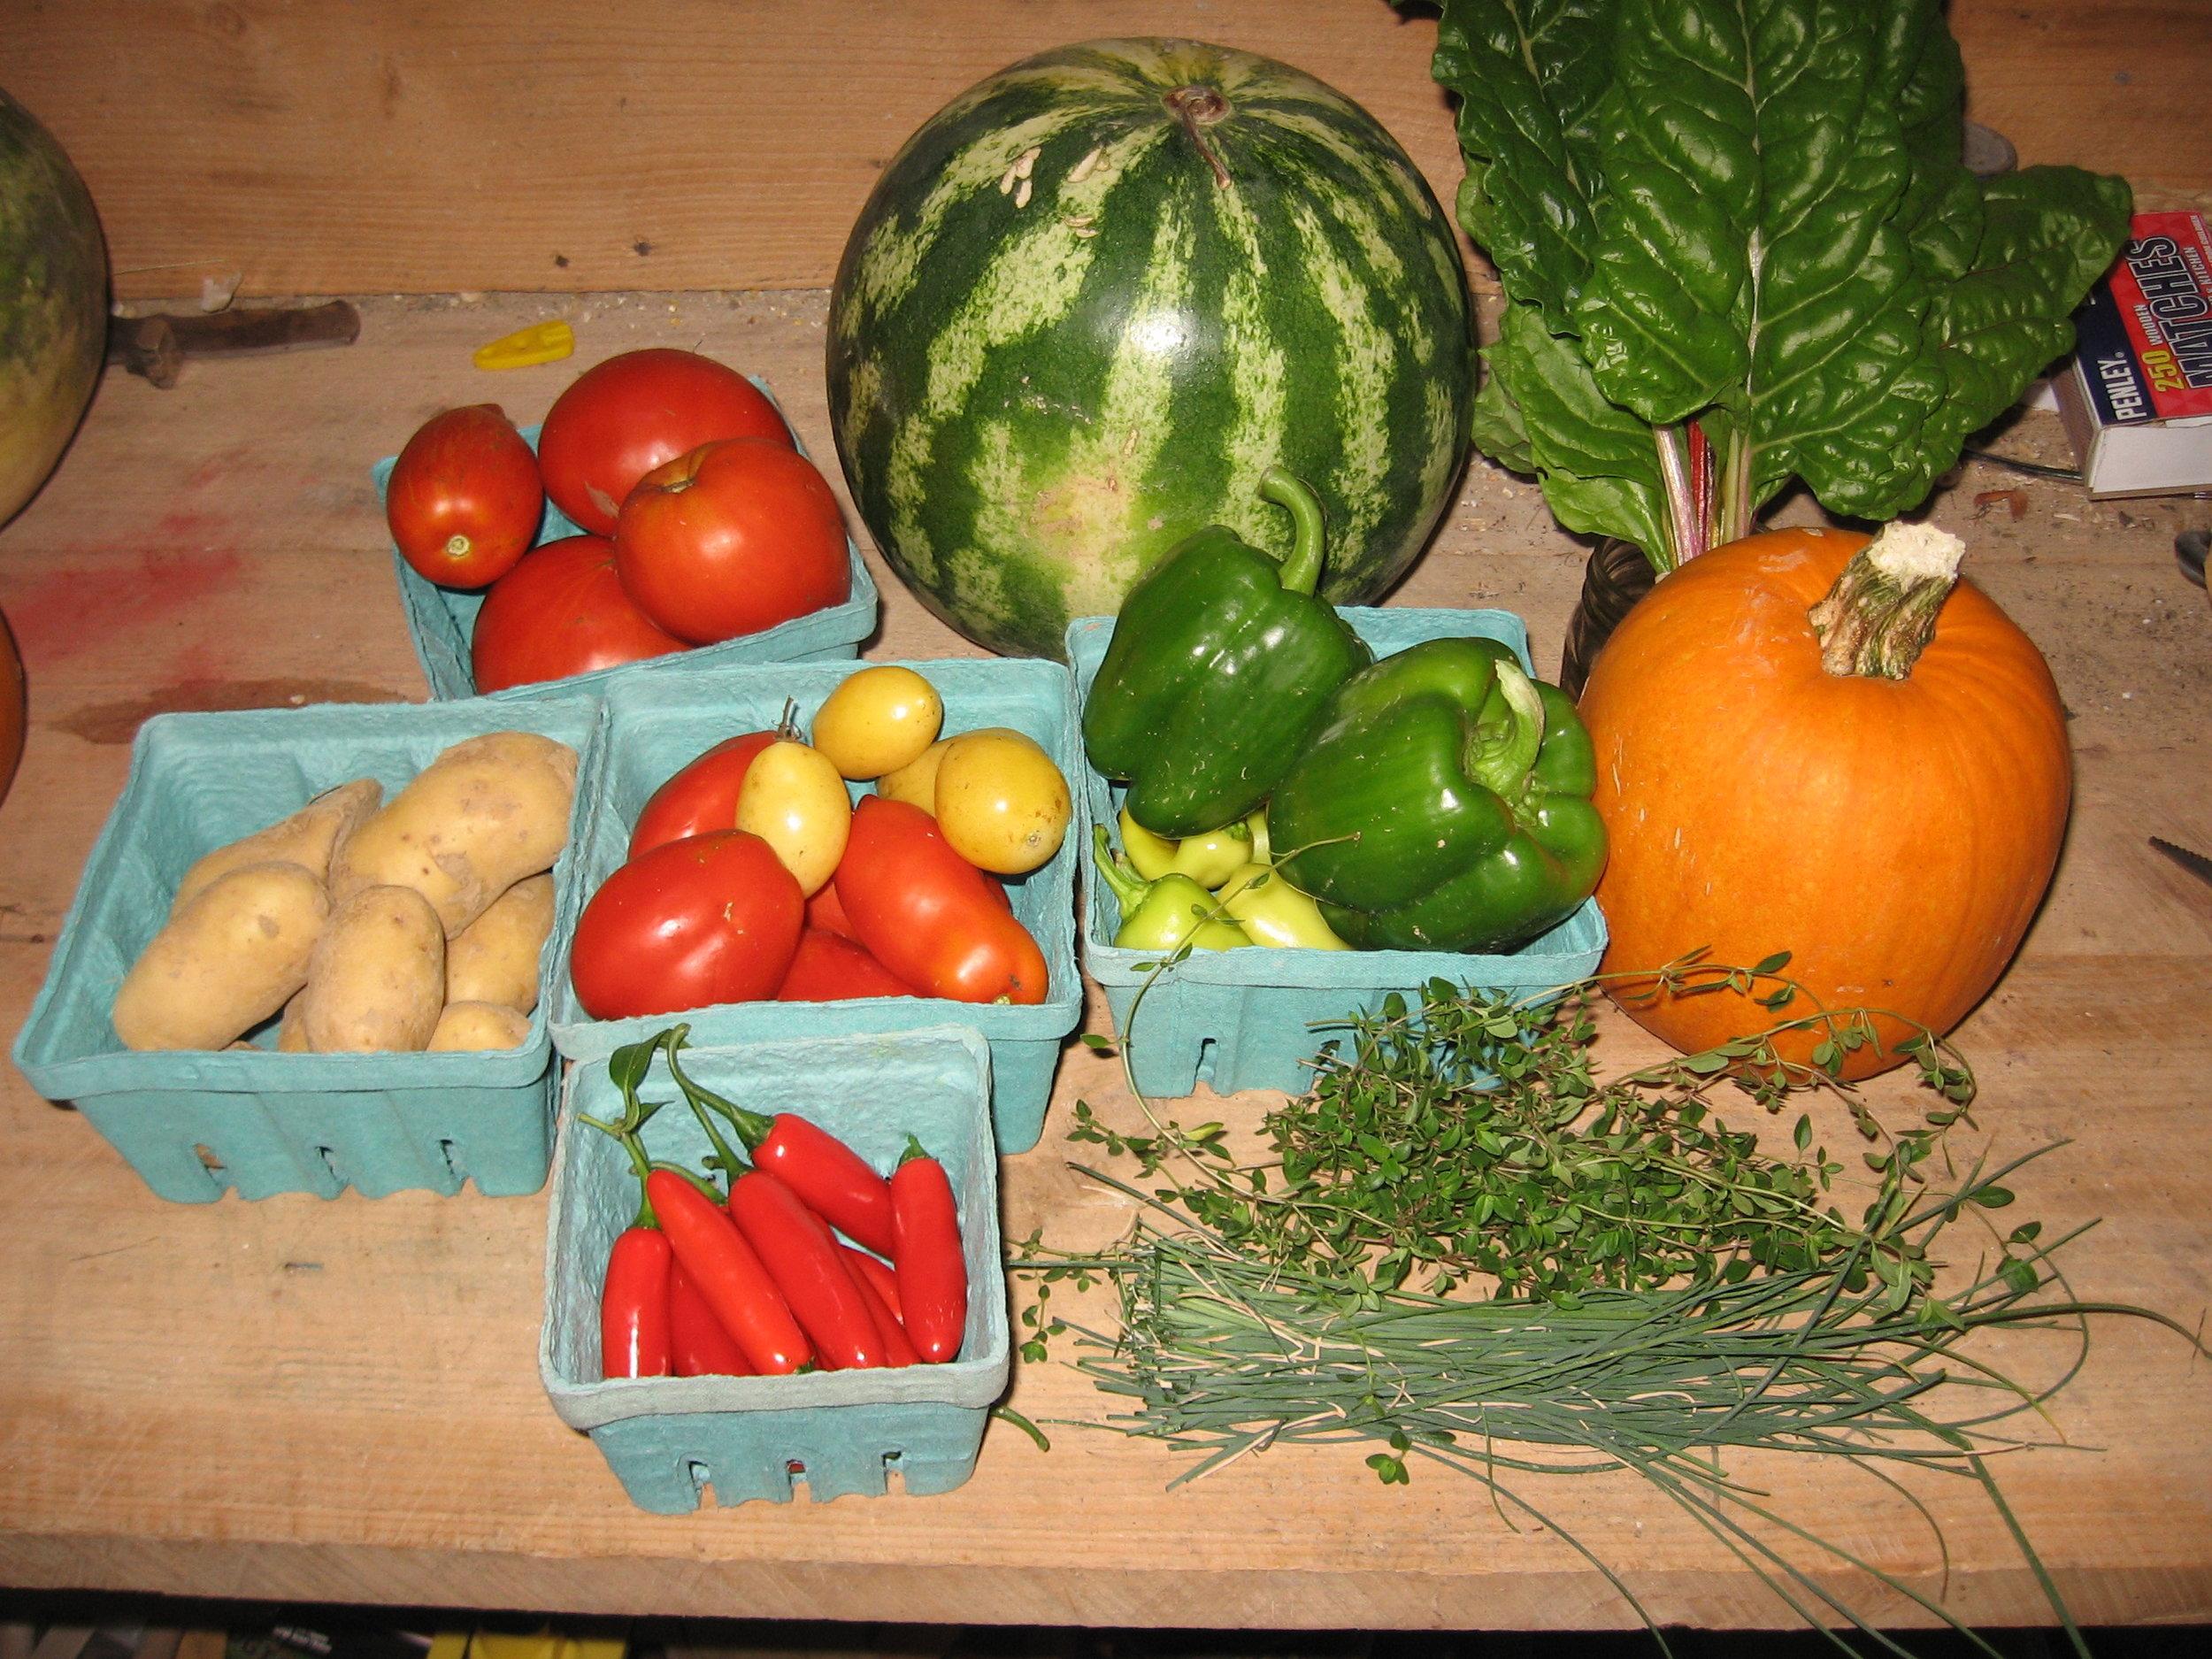 Fresh grown organic produce tastes the best!